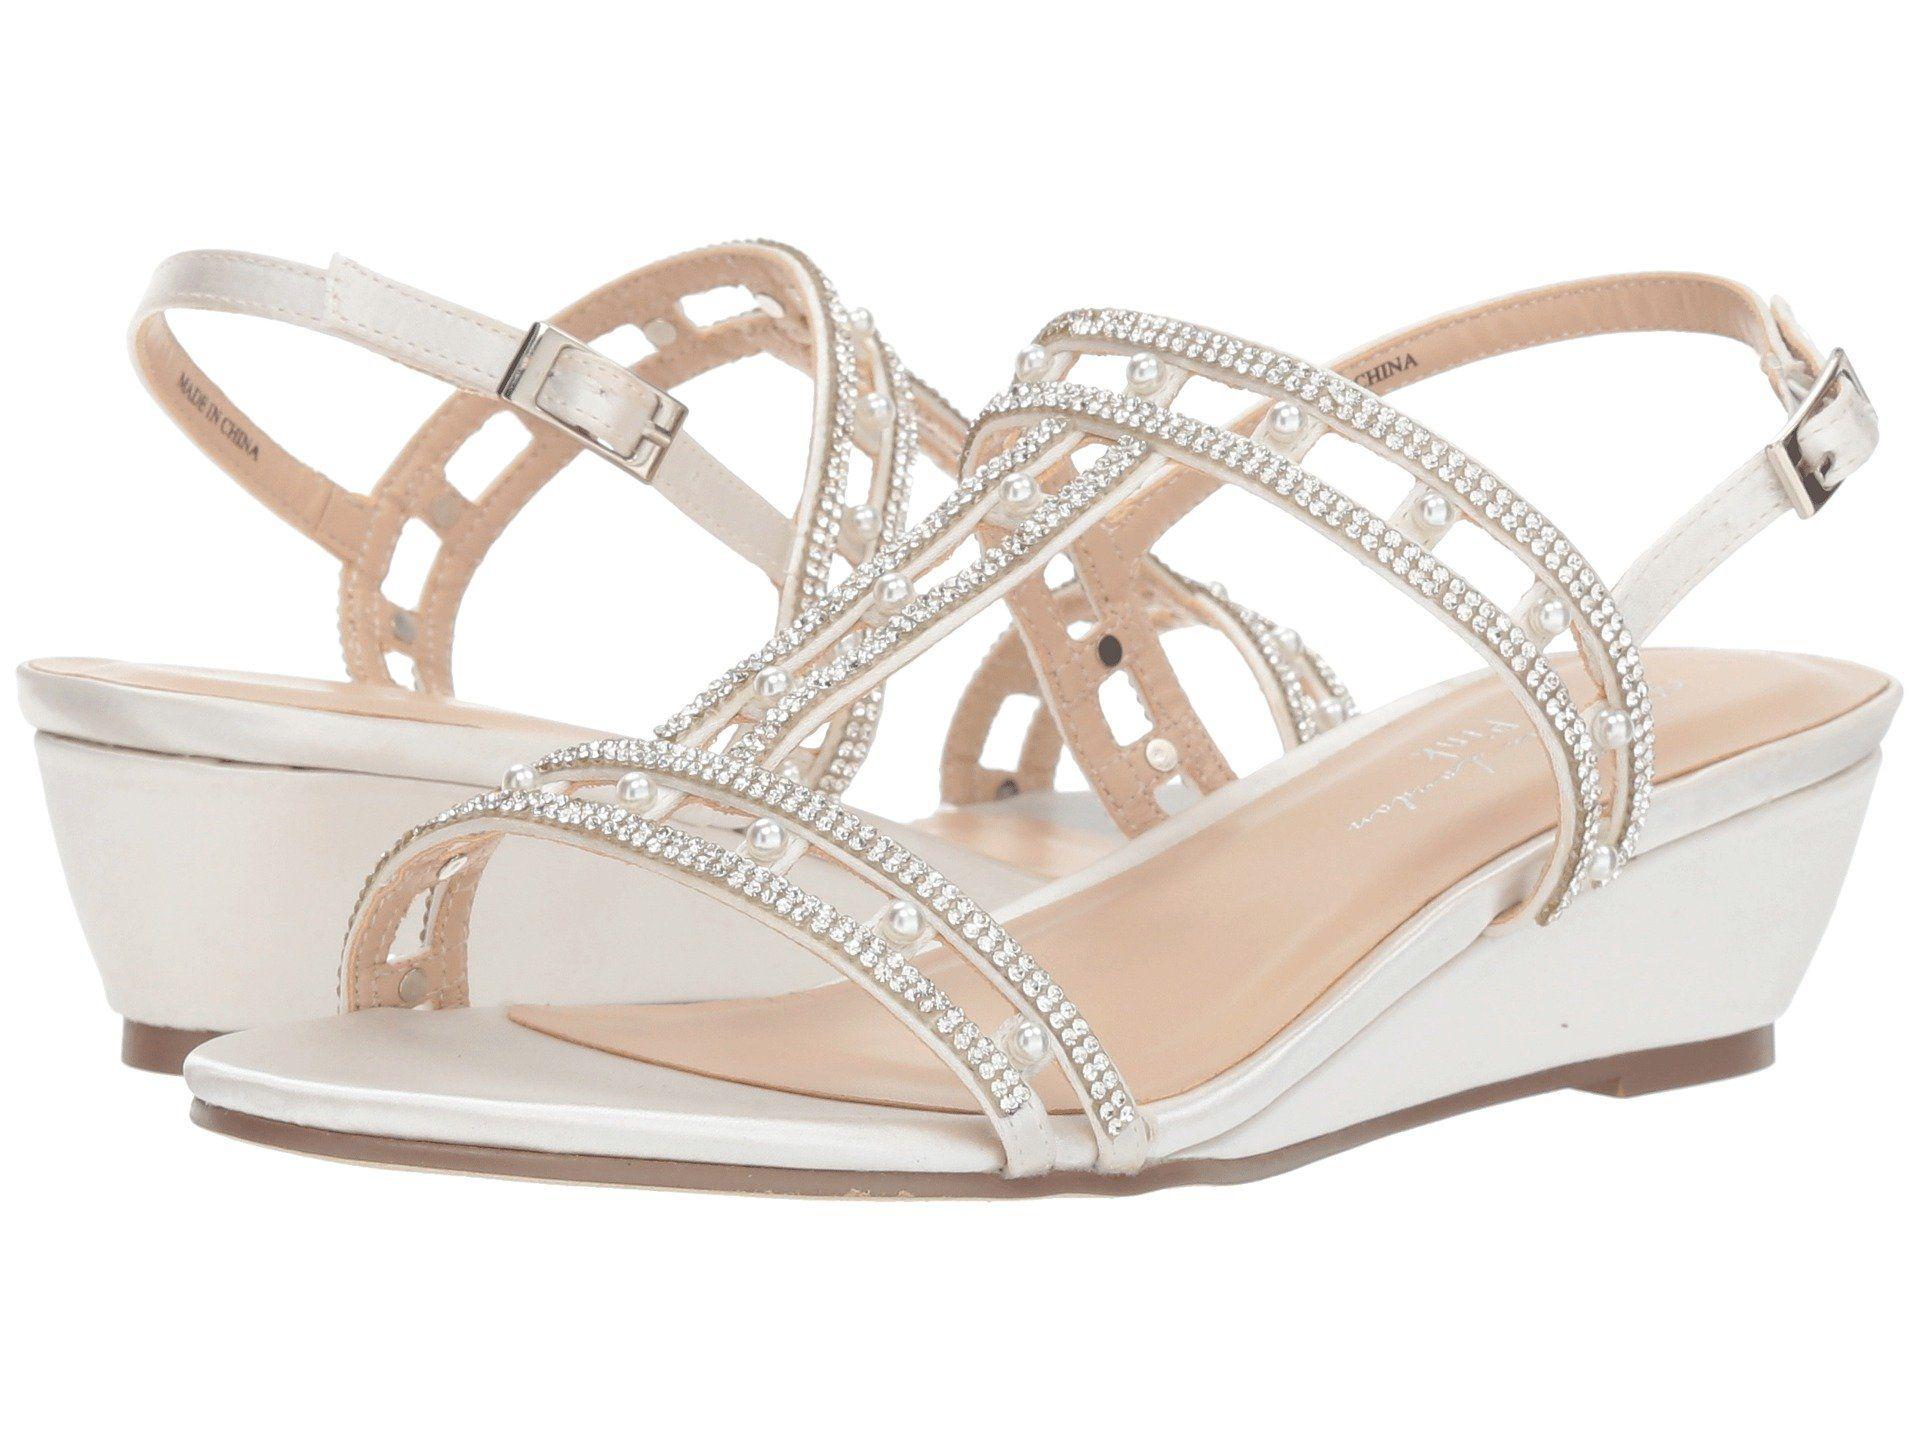 0ab02a8858b57 24 Chic Beach Wedding Shoes